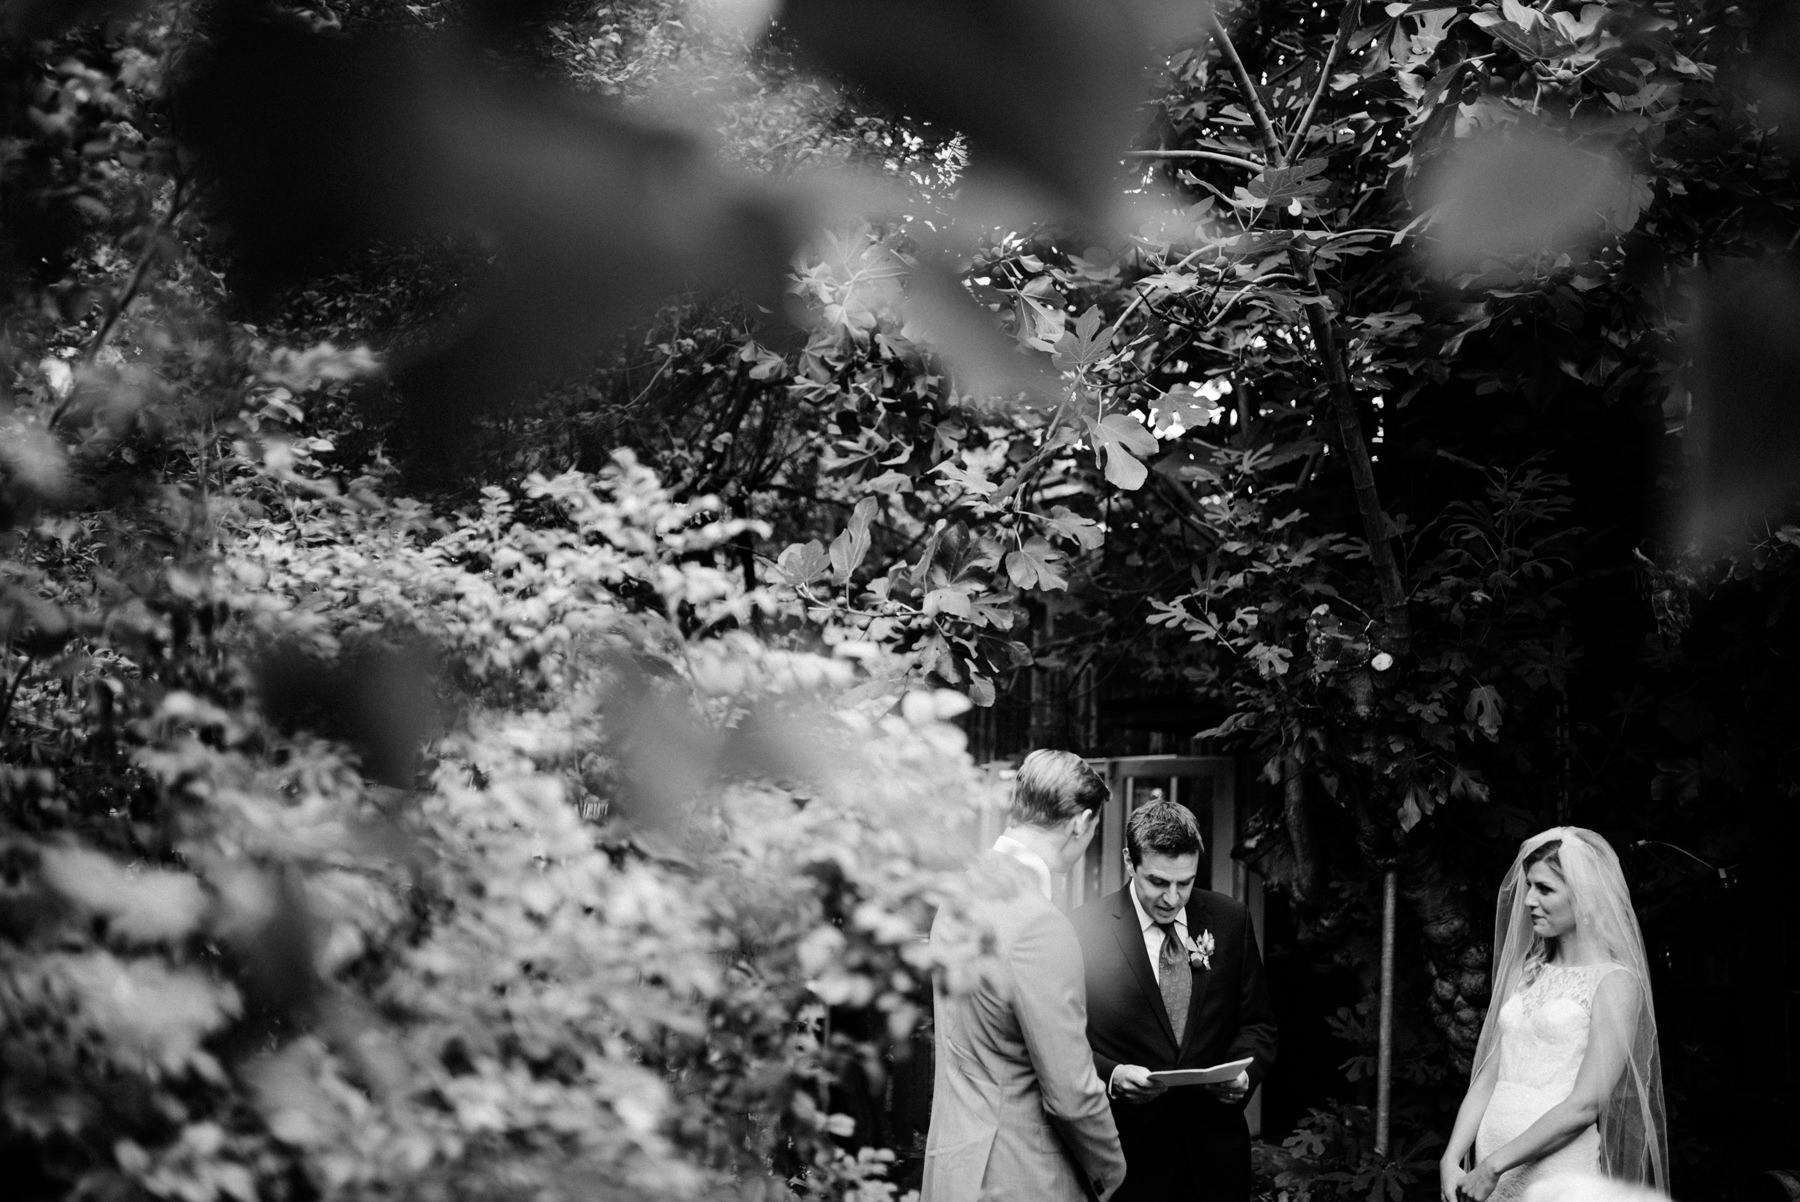 210-outdoor-wedding-ceremony-at-the-corson-building.jpg